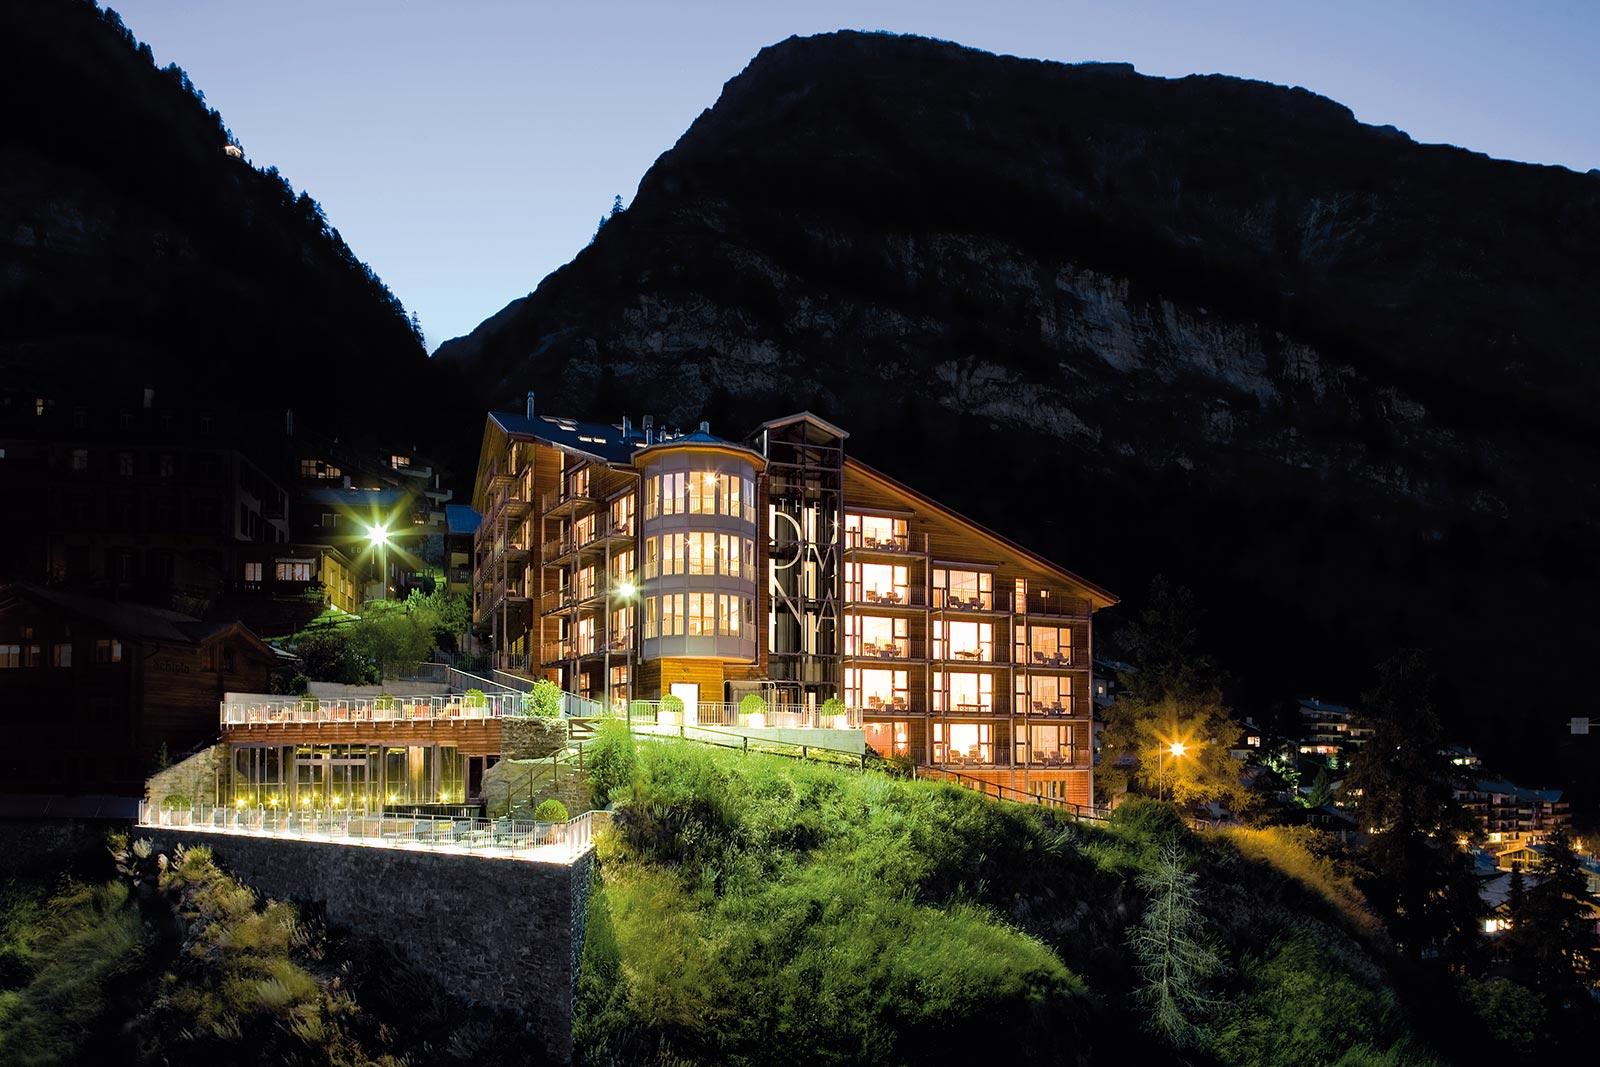 The Omnia Hotel a Zermatt